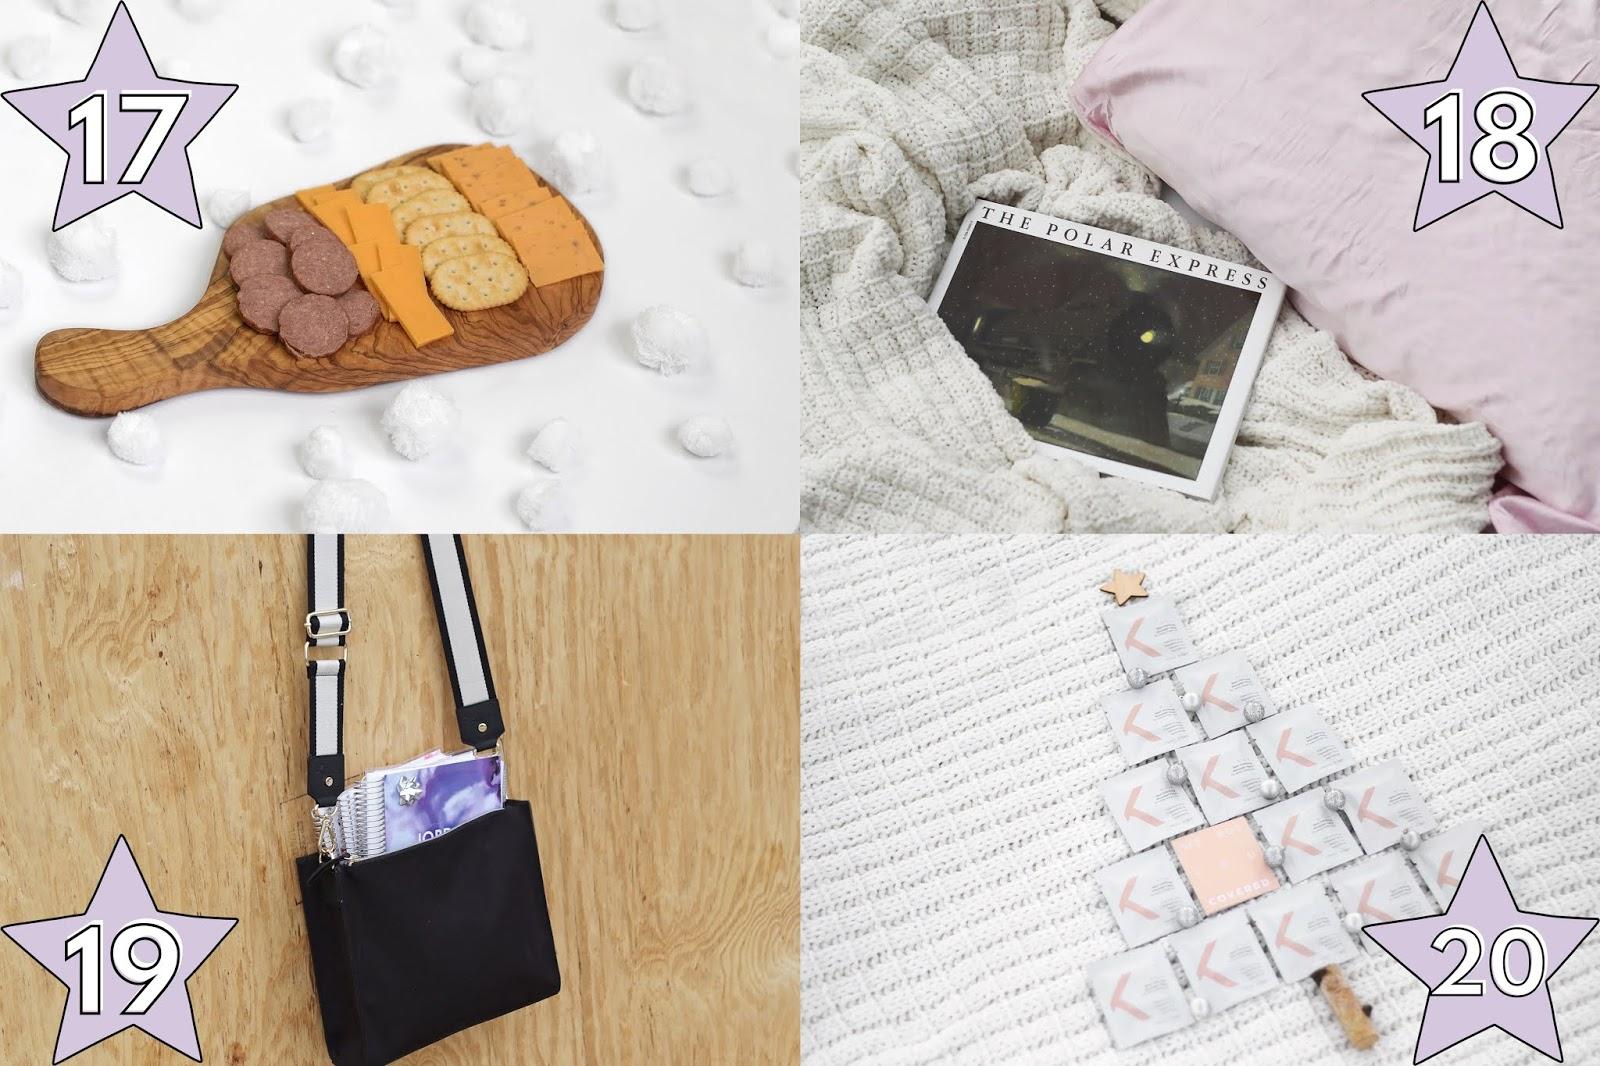 trader's joe olive wood cheese board gift idea, Erin Condren planner tote gift idea for college students, Kerotin silk pillowcase gift idea, affordable silk pillowcase for her, ZitSticka gift idea, college student gift guide ideas